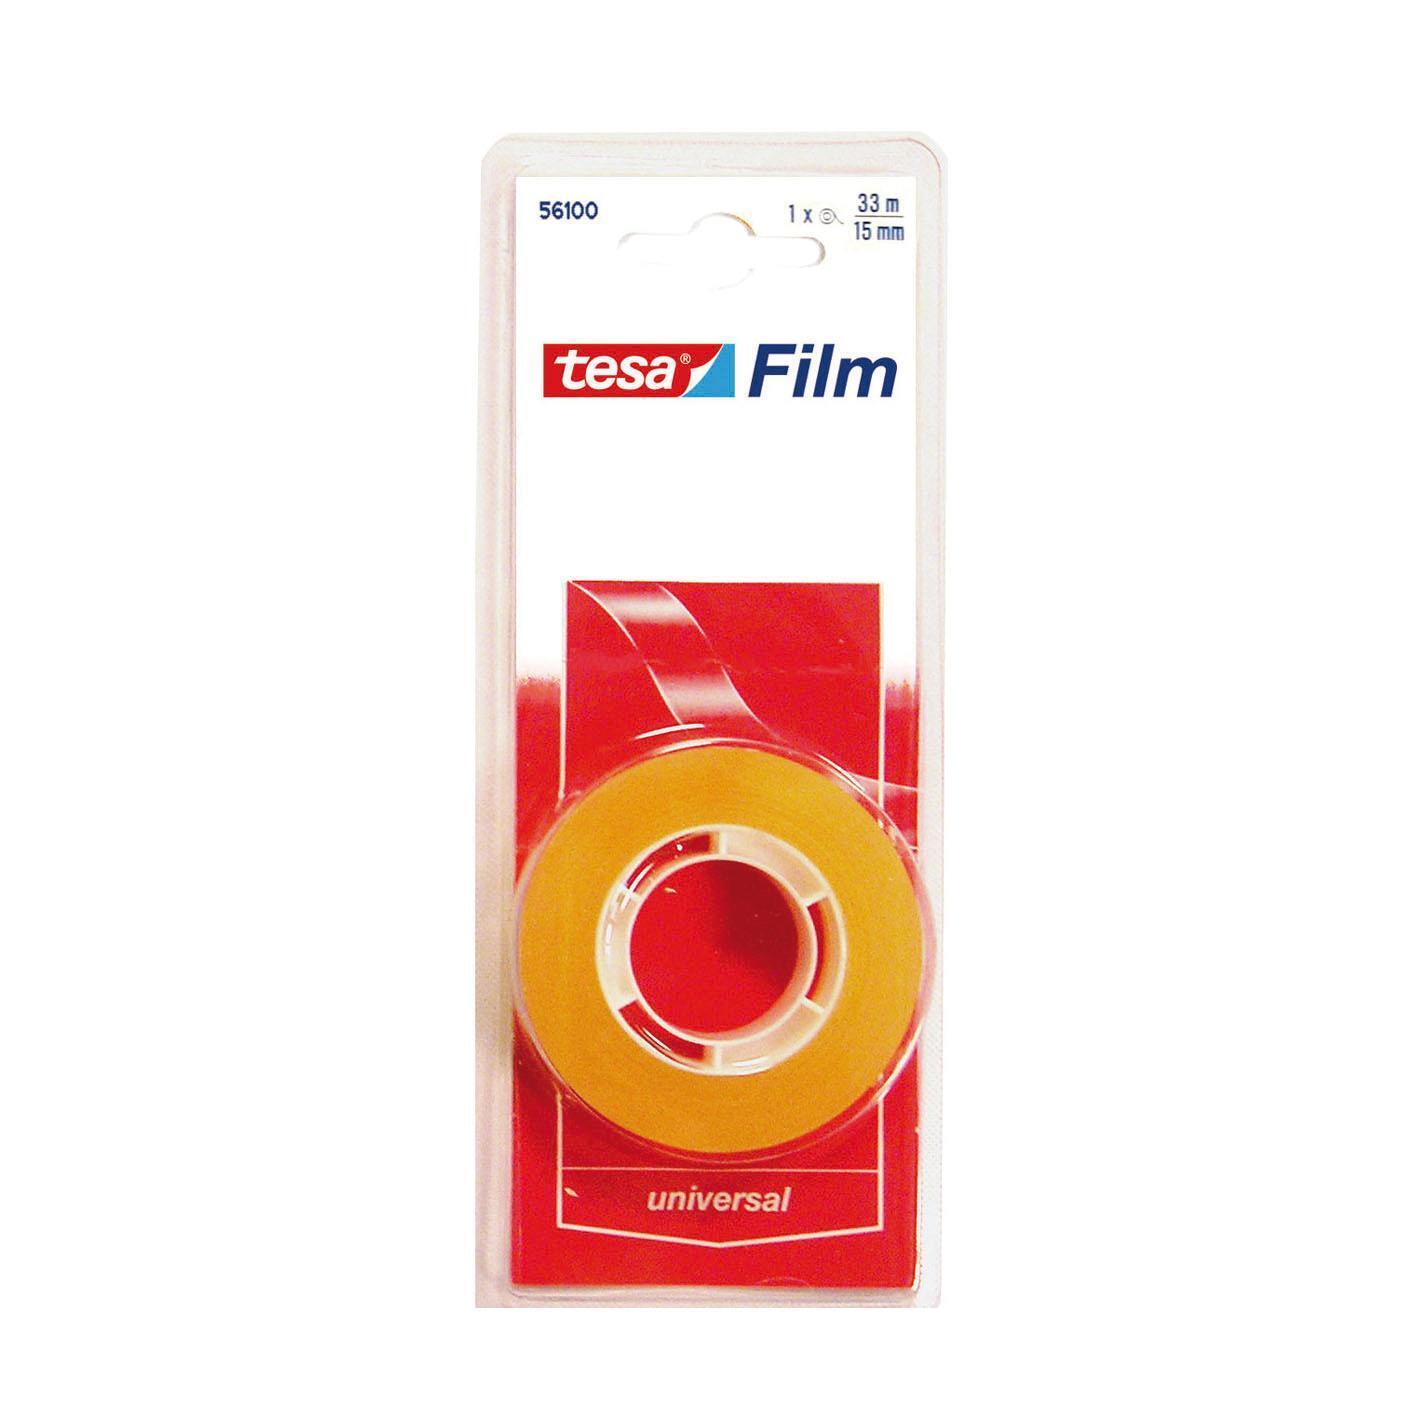 Nastro adesivo TESA tesafilm 15 mm x 0.015 m trasparente - 1